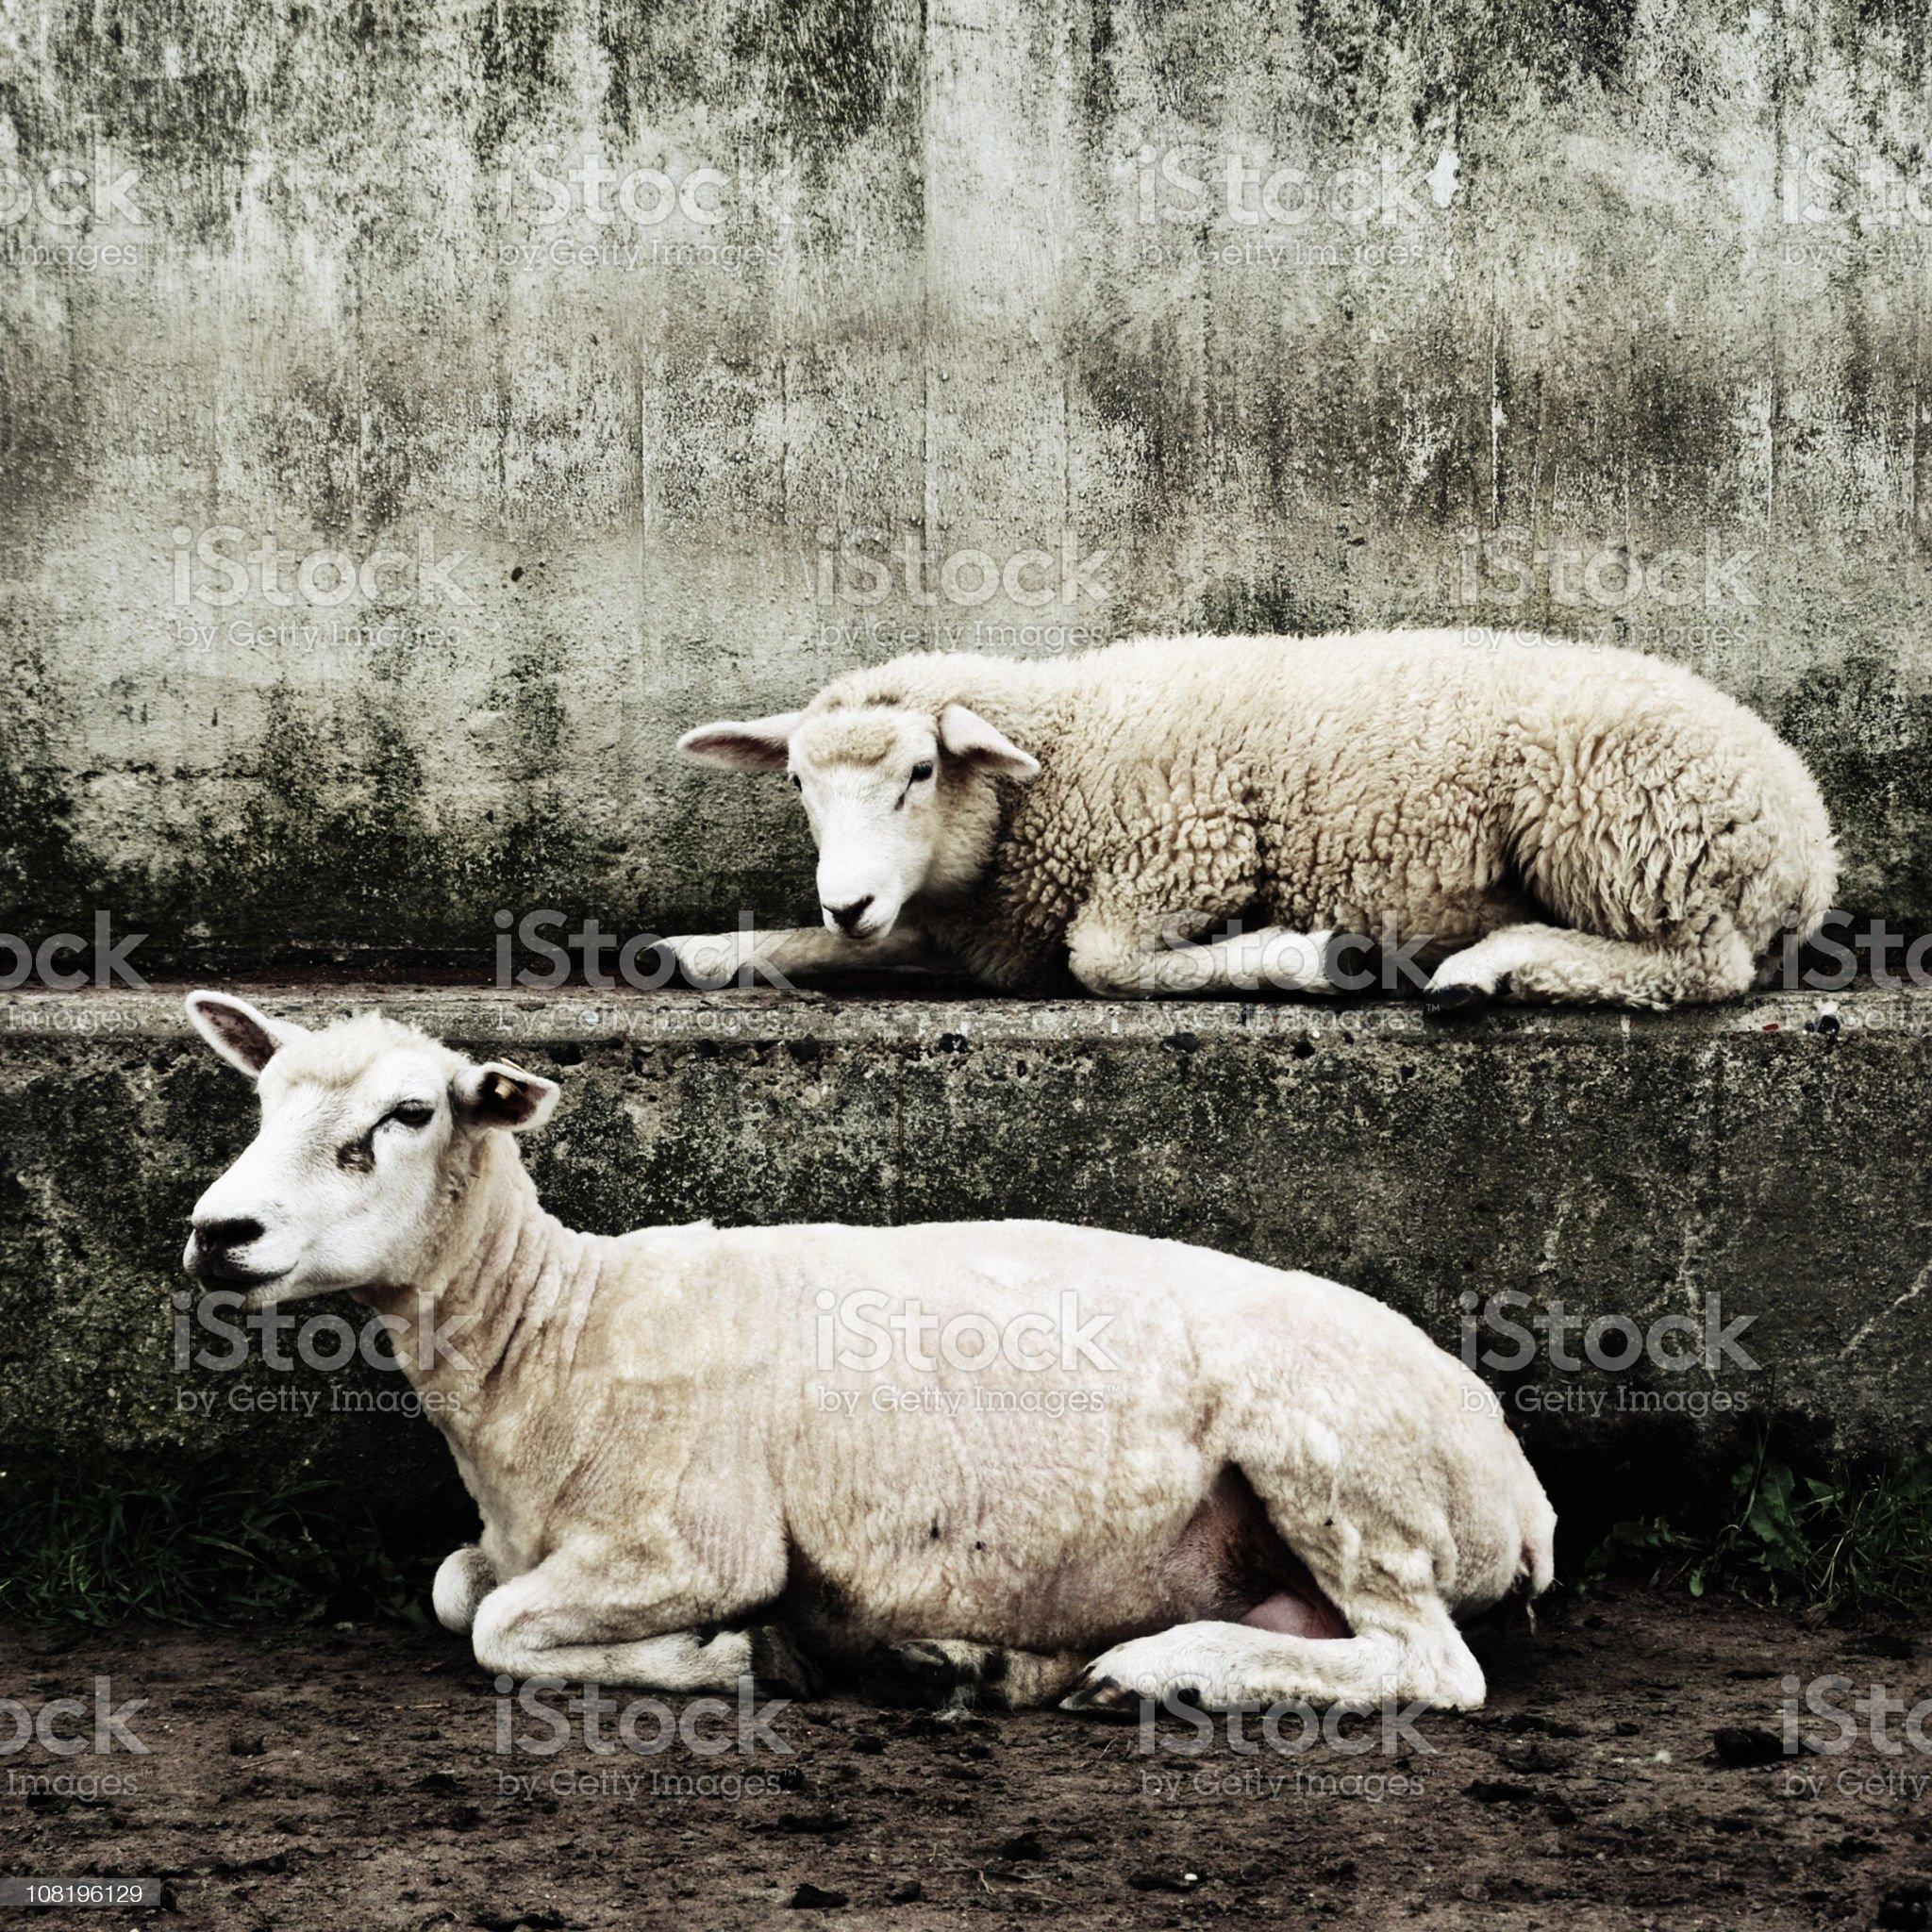 Two Sheep Sleeping on Concrete Wall royalty-free stock photo